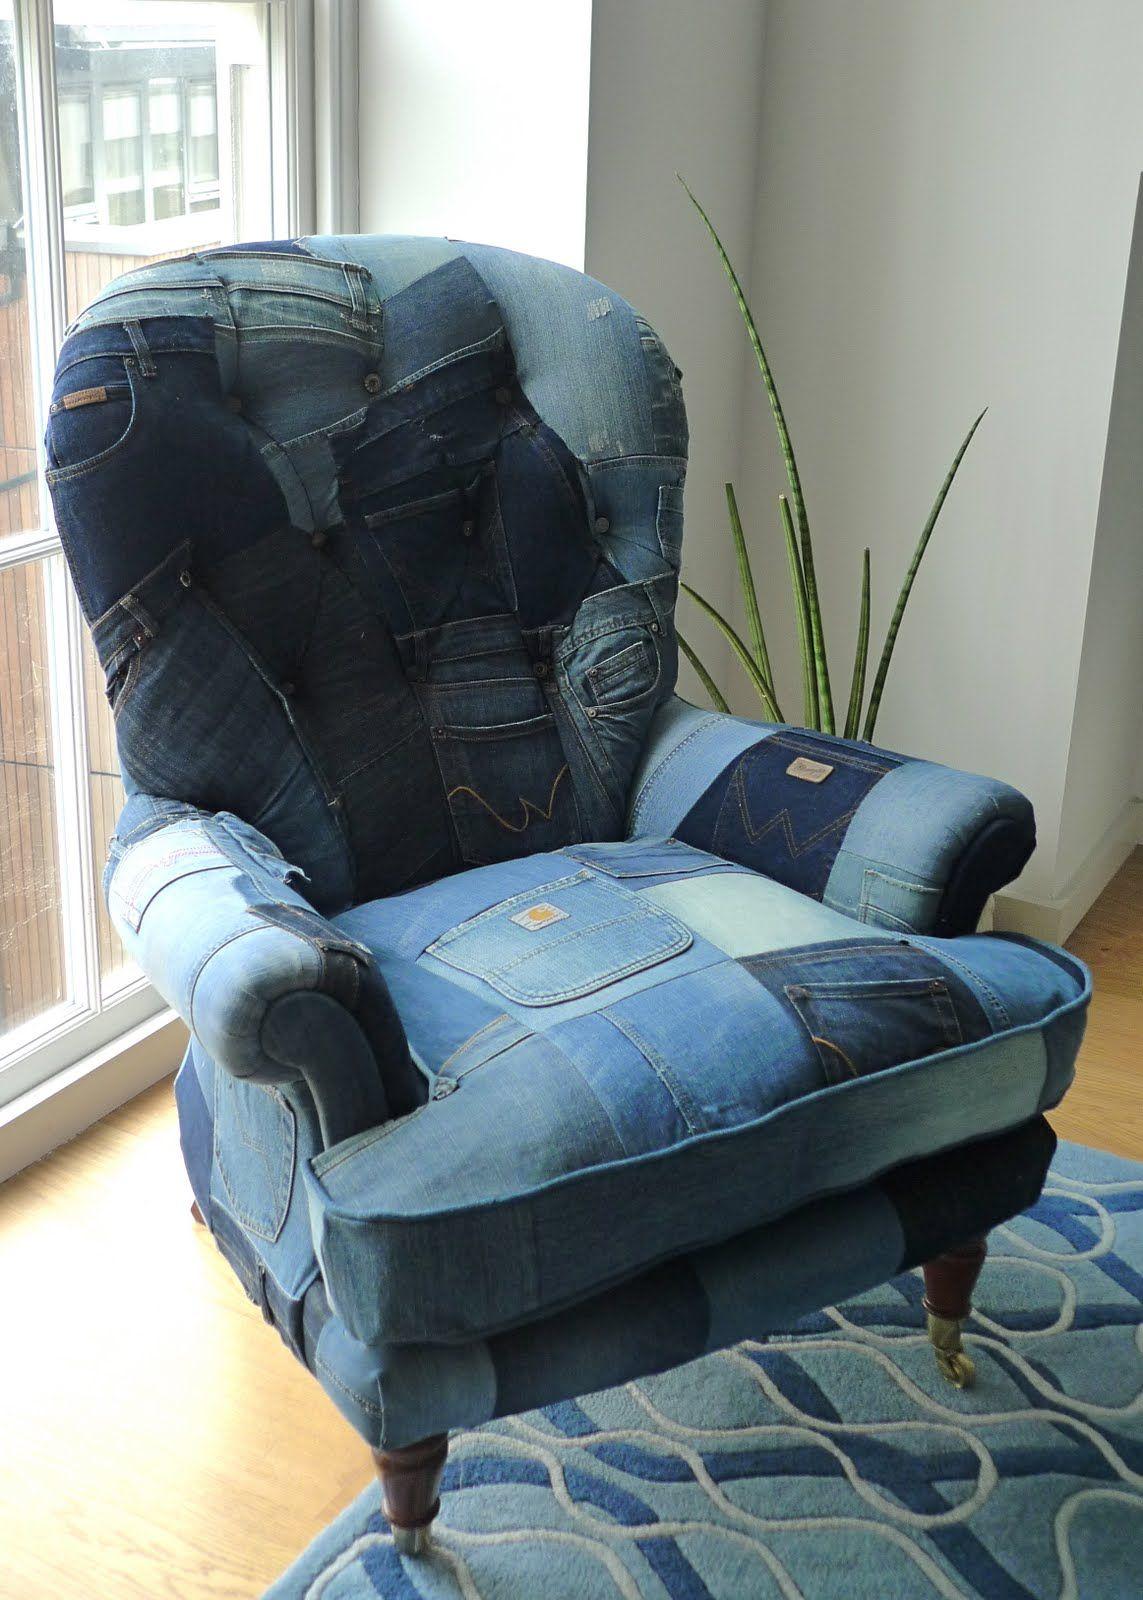 denim upholstered armchair | Recycled Denim Ideas ...